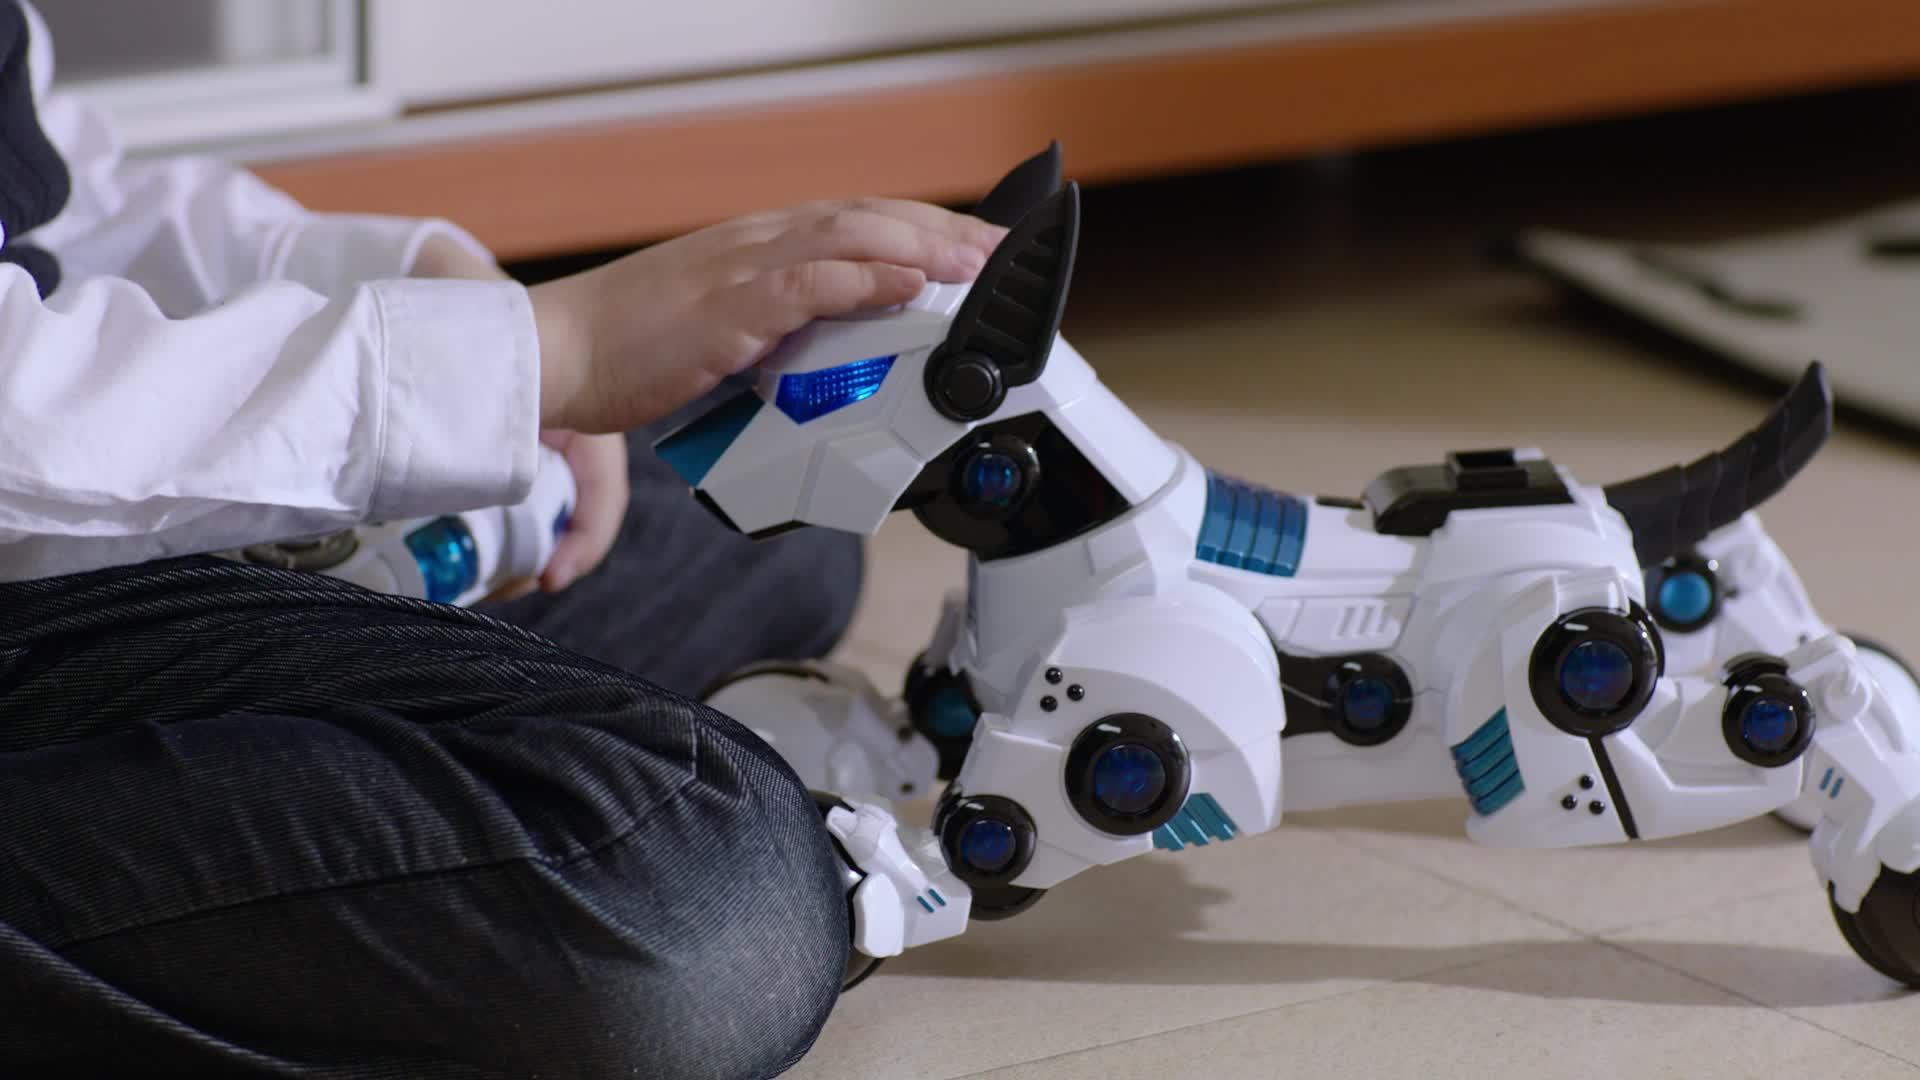 Rastar Electric Robot Smart Dog Toy For Kids